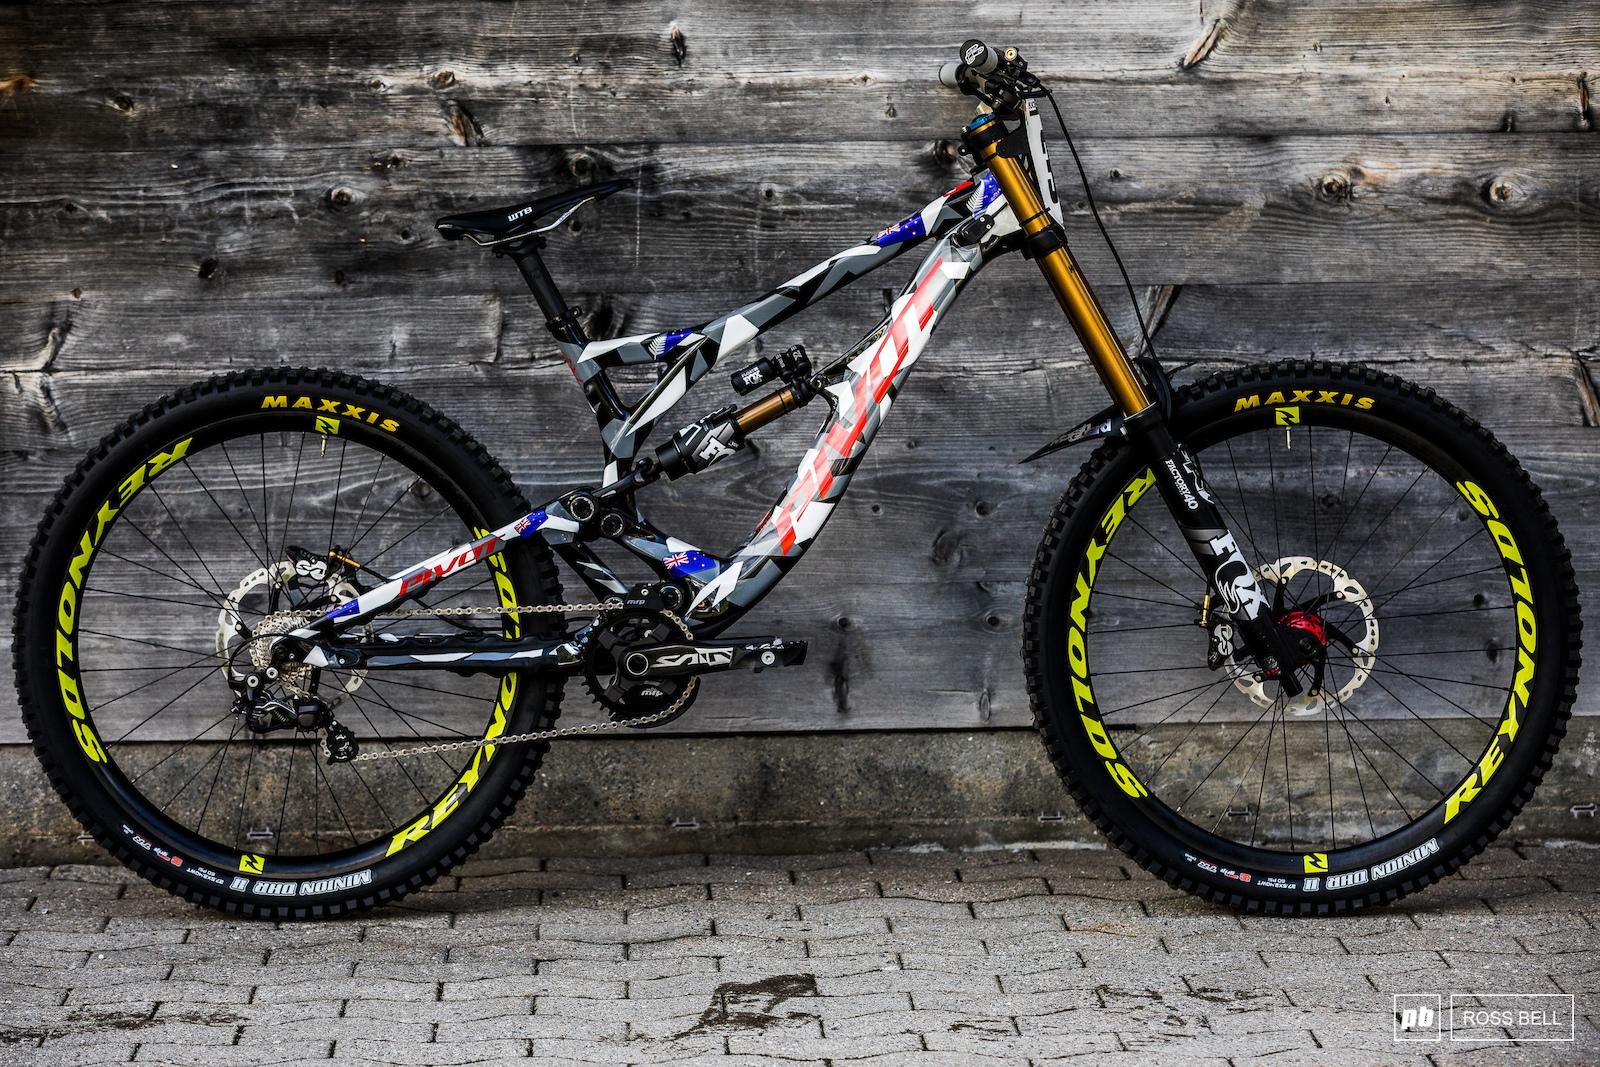 36d5e6937ea Part 2: Custom World Champs Bike Gallery - Lenzerheide DH World ...